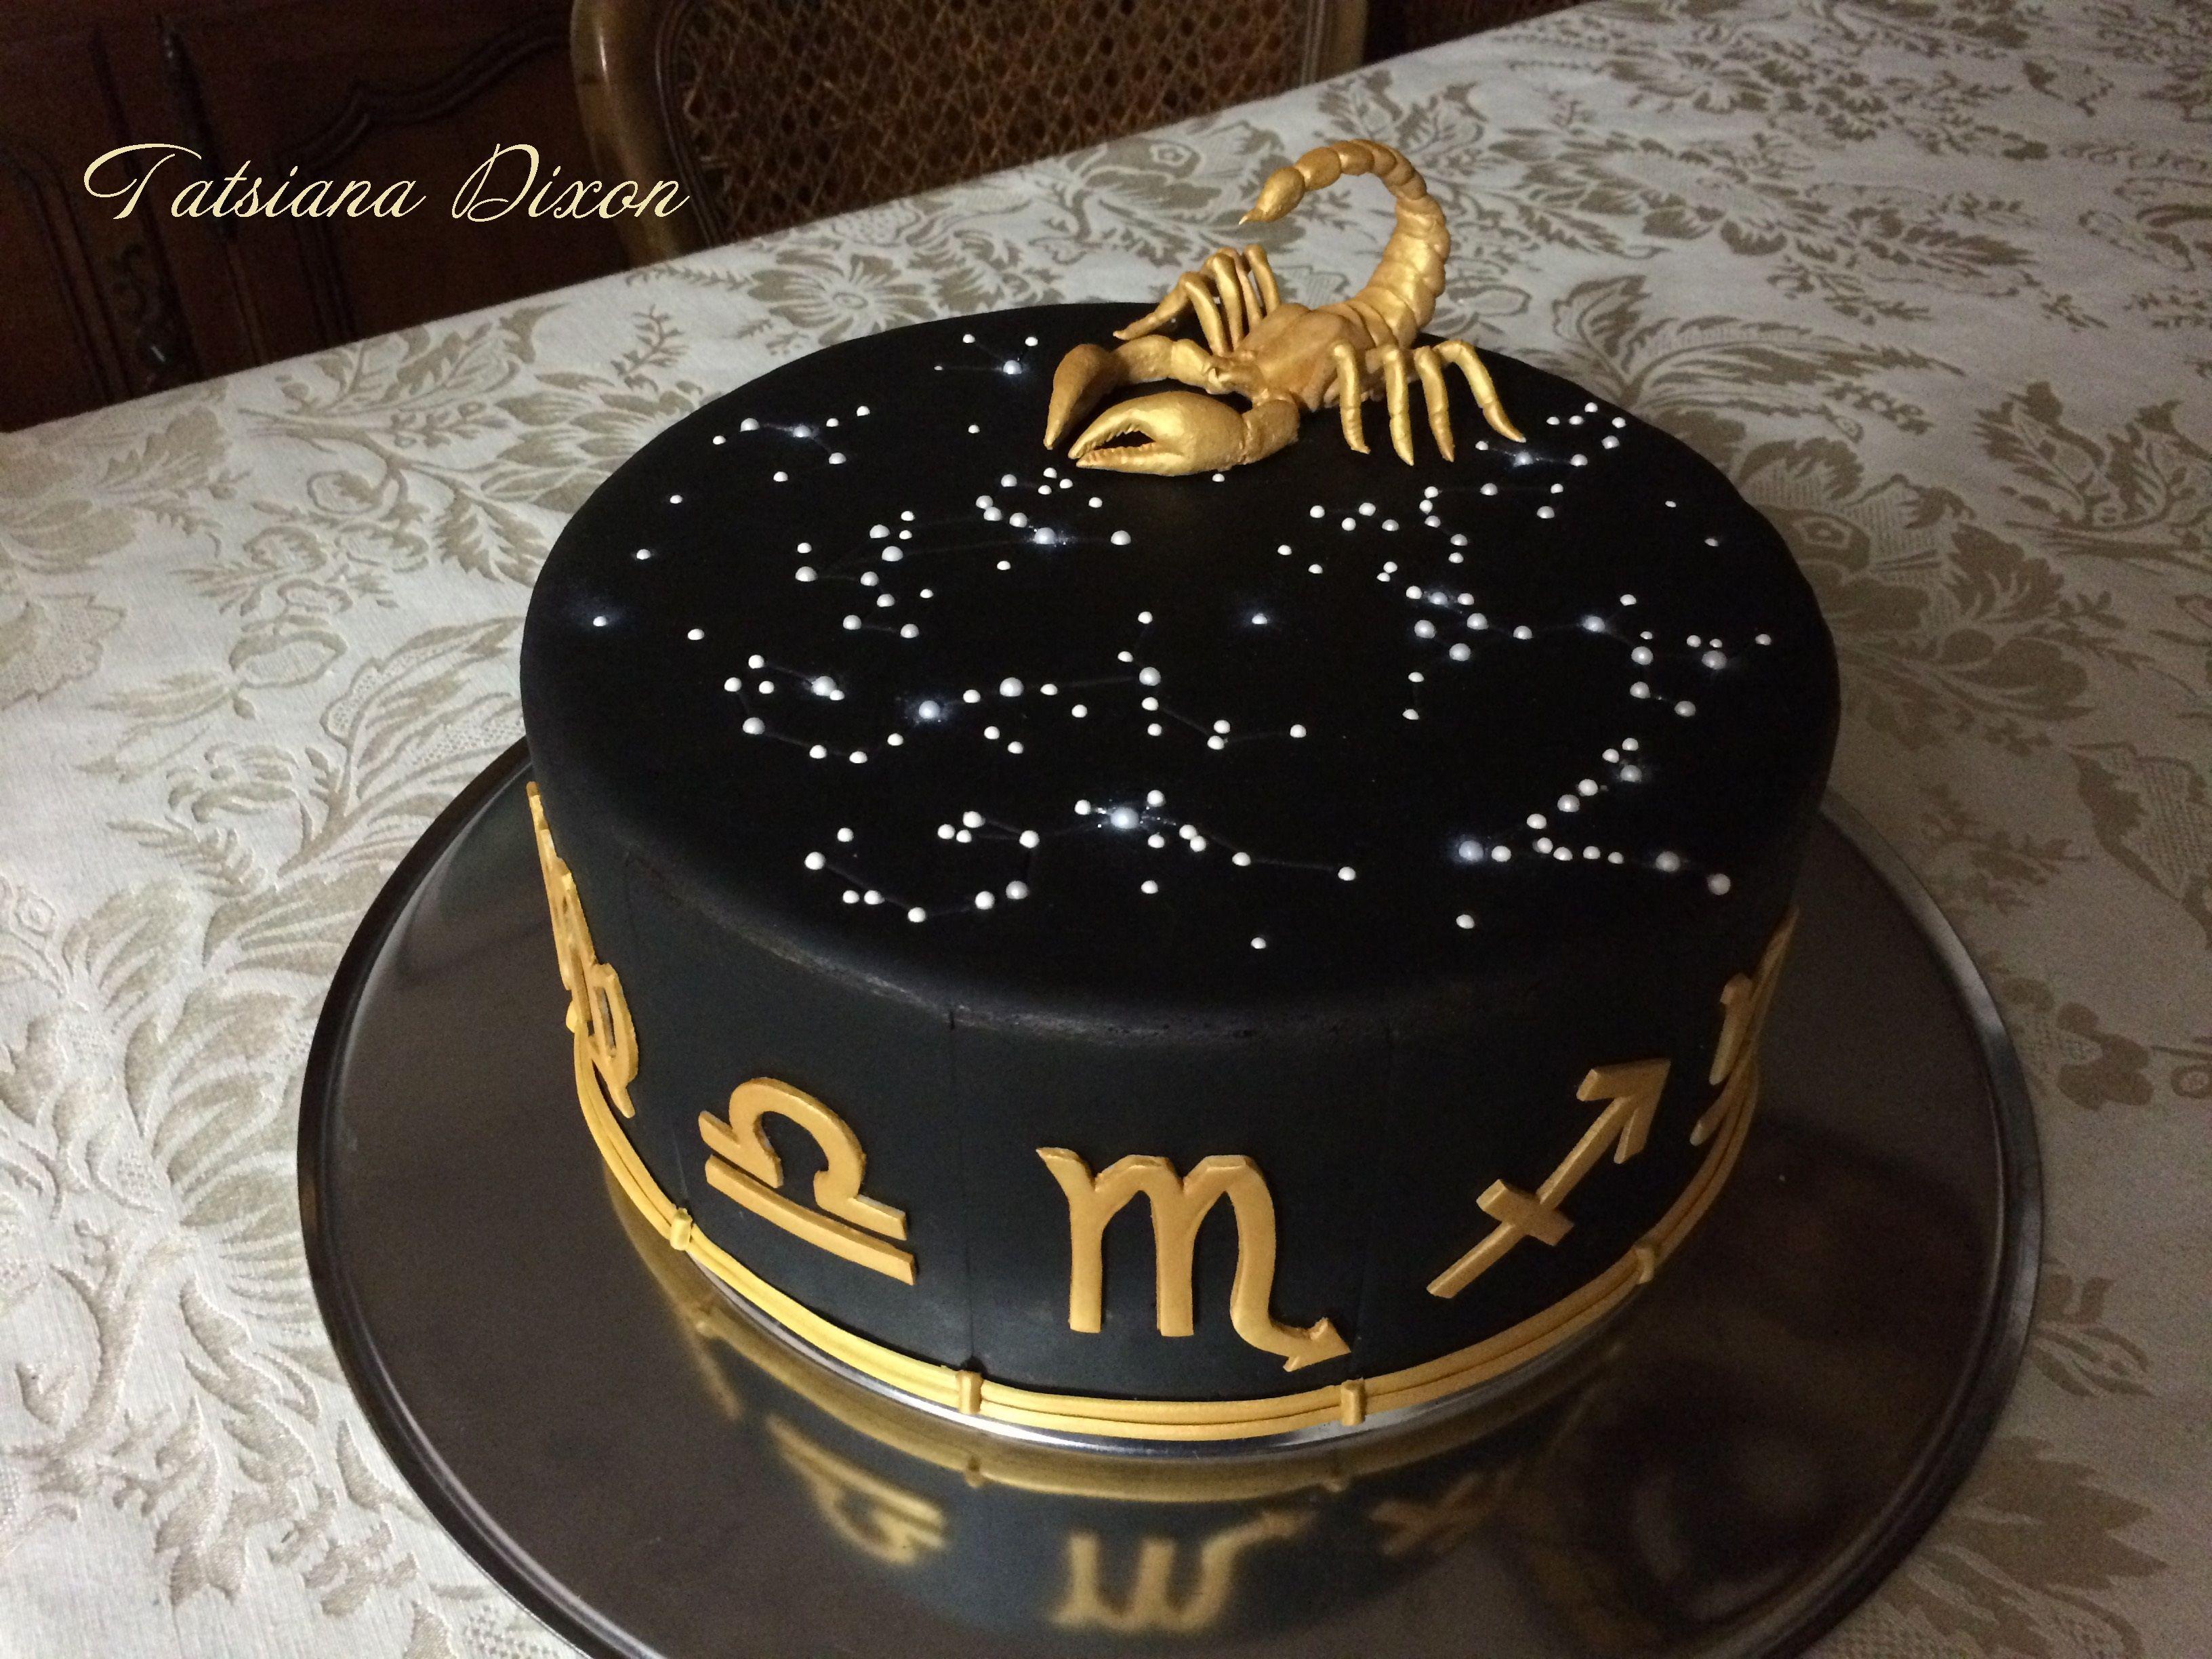 Horoscope cake